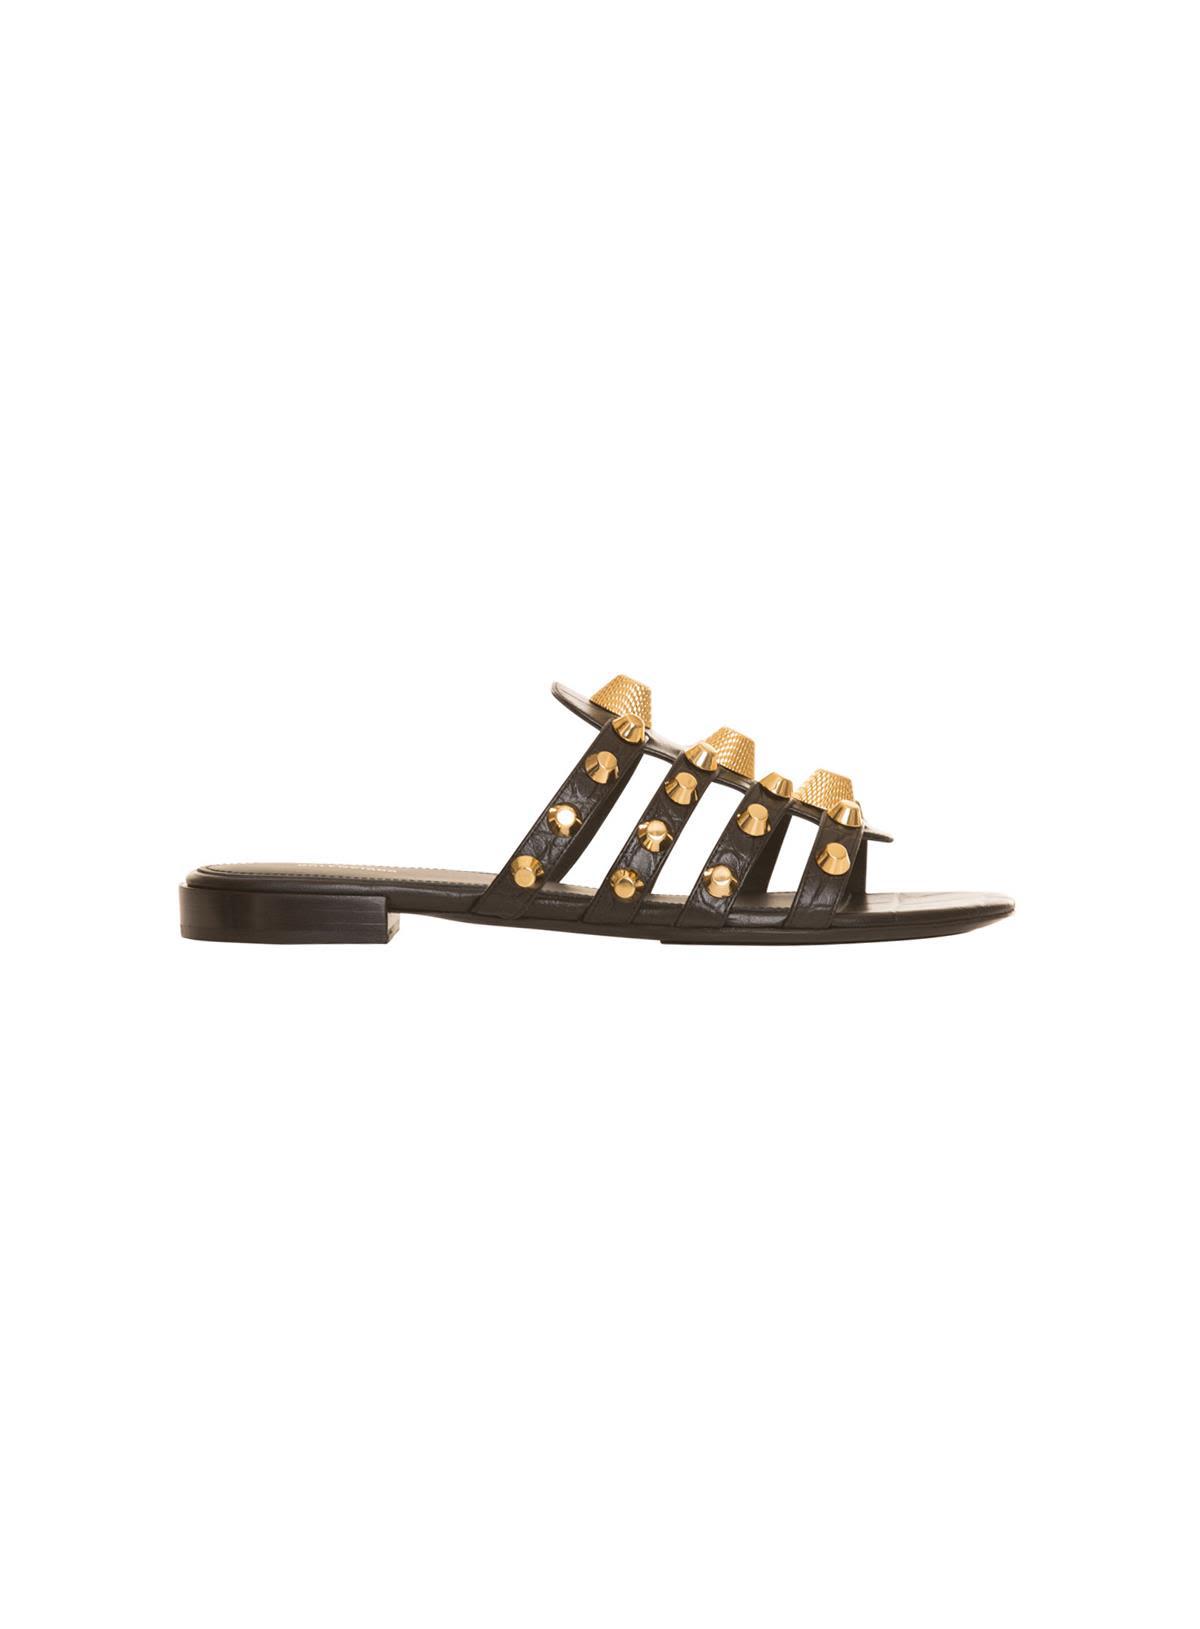 800efb48224 Balenciaga Mixed-Stud Leather Slide Flat Sandals